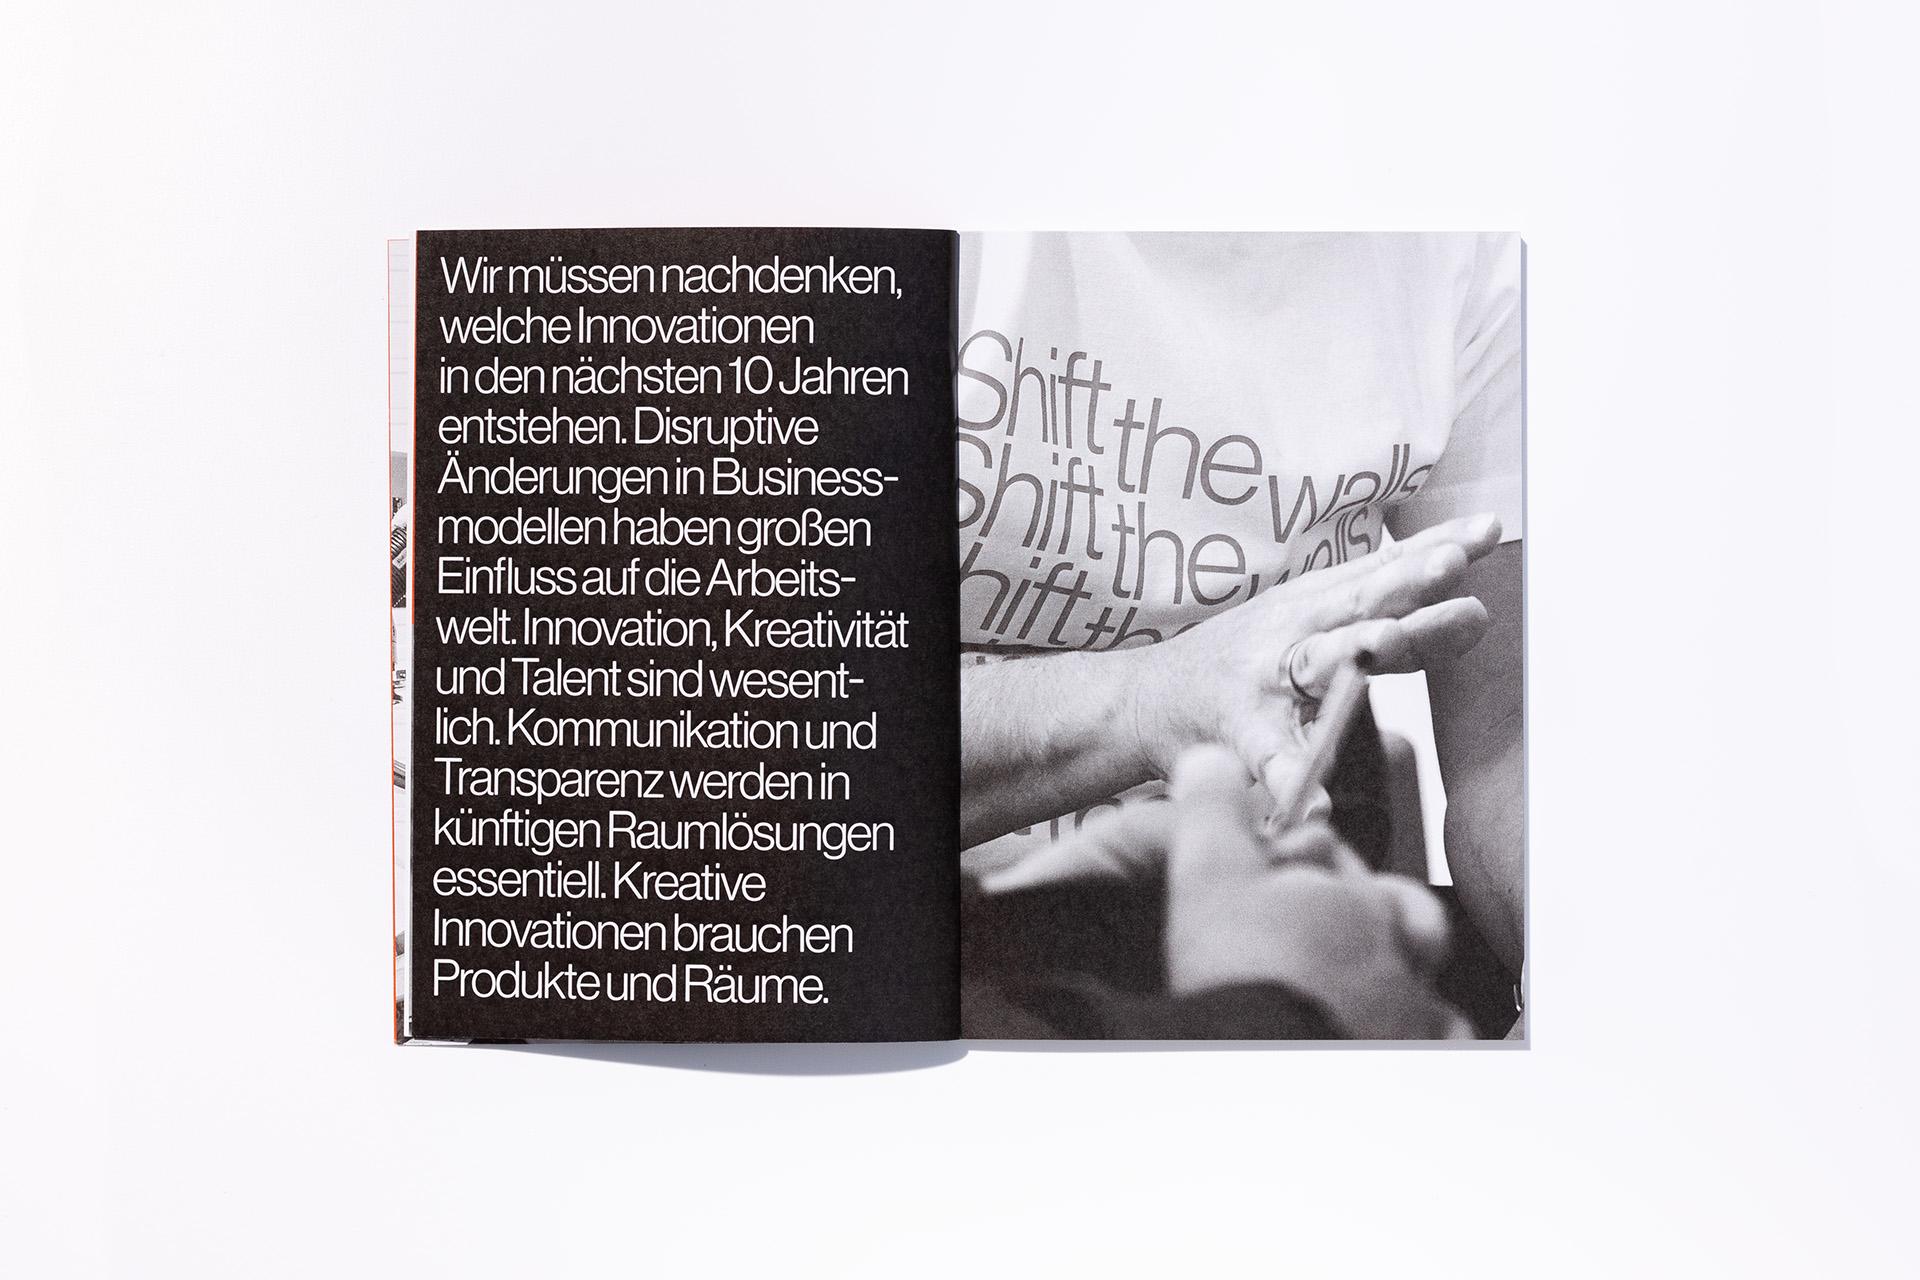 Stuttgart Report